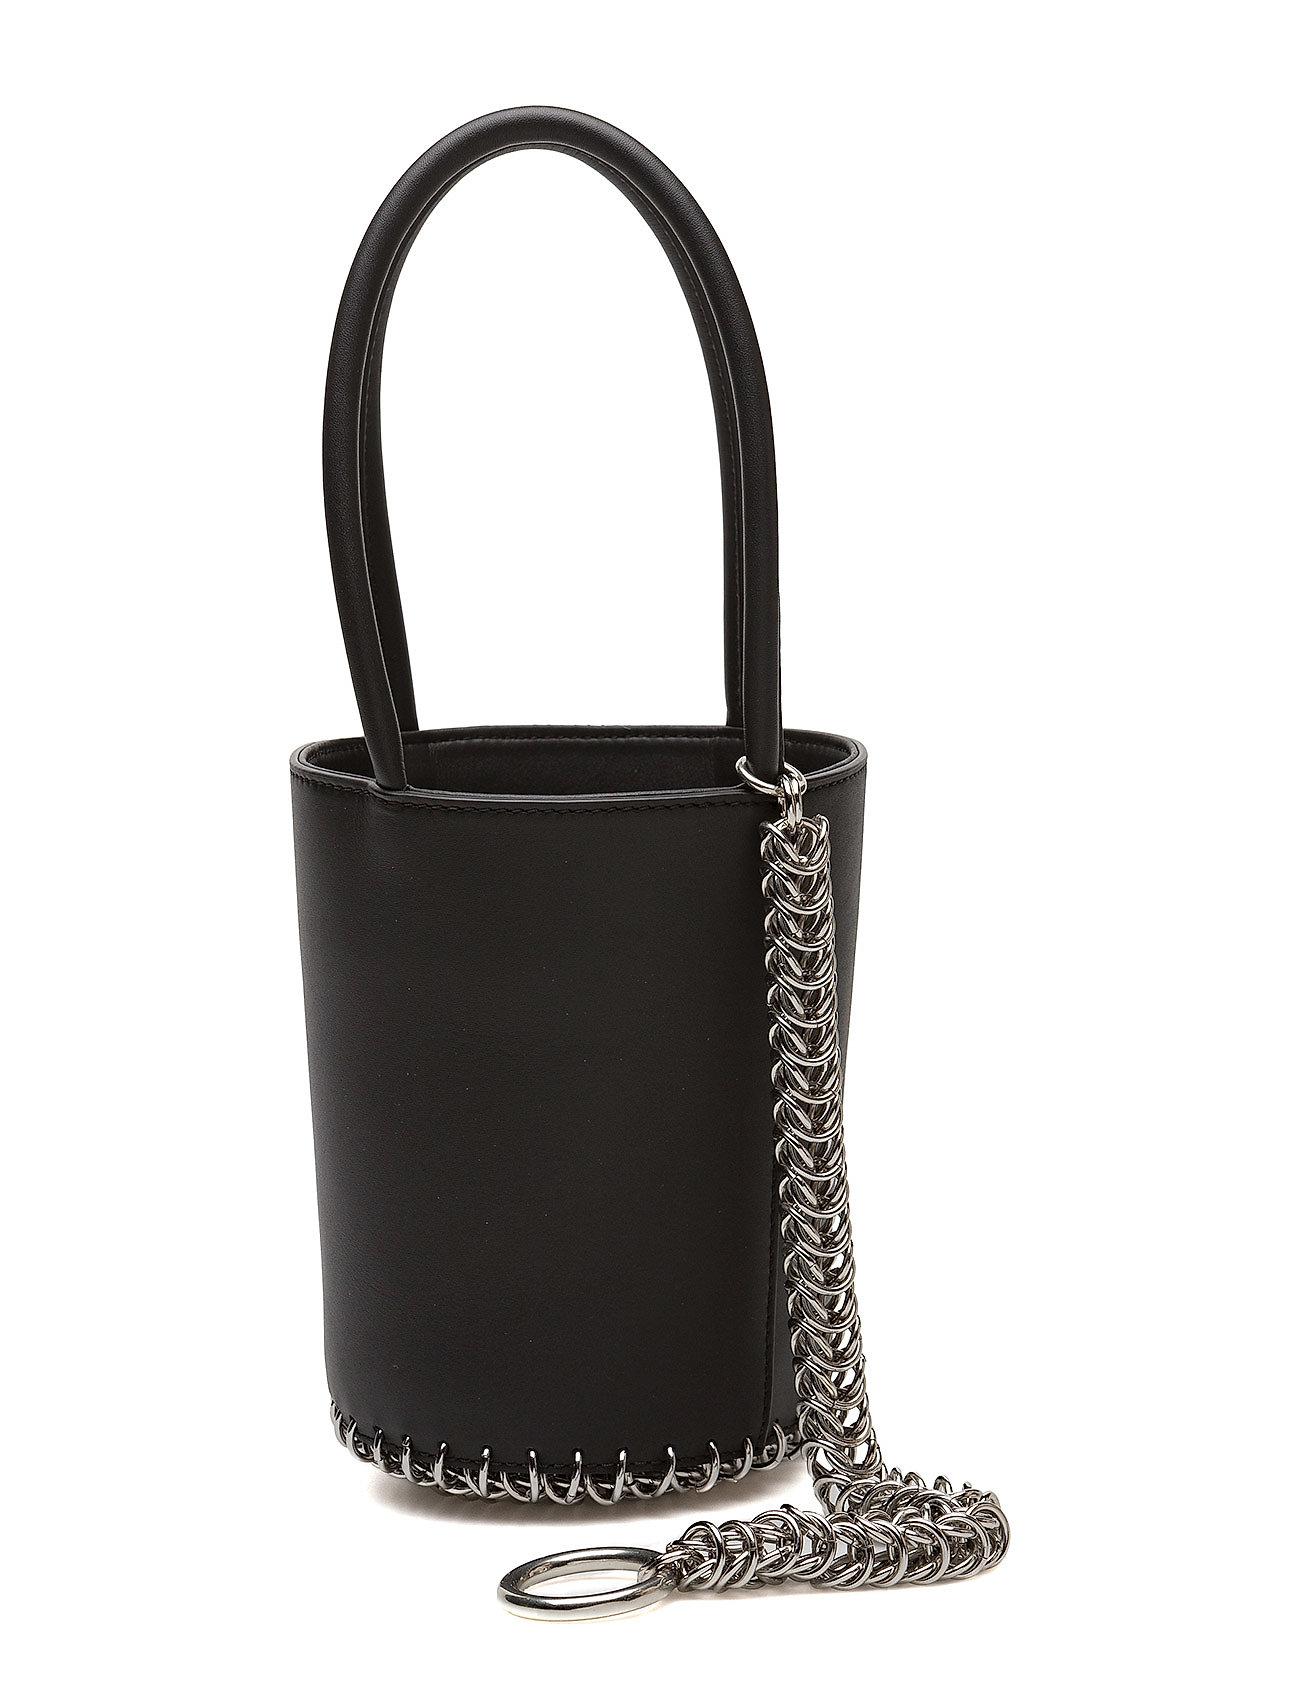 Roxy mini bucket blk w/boxchn smooth shiny calf/ir fra alexander wang på boozt.com dk